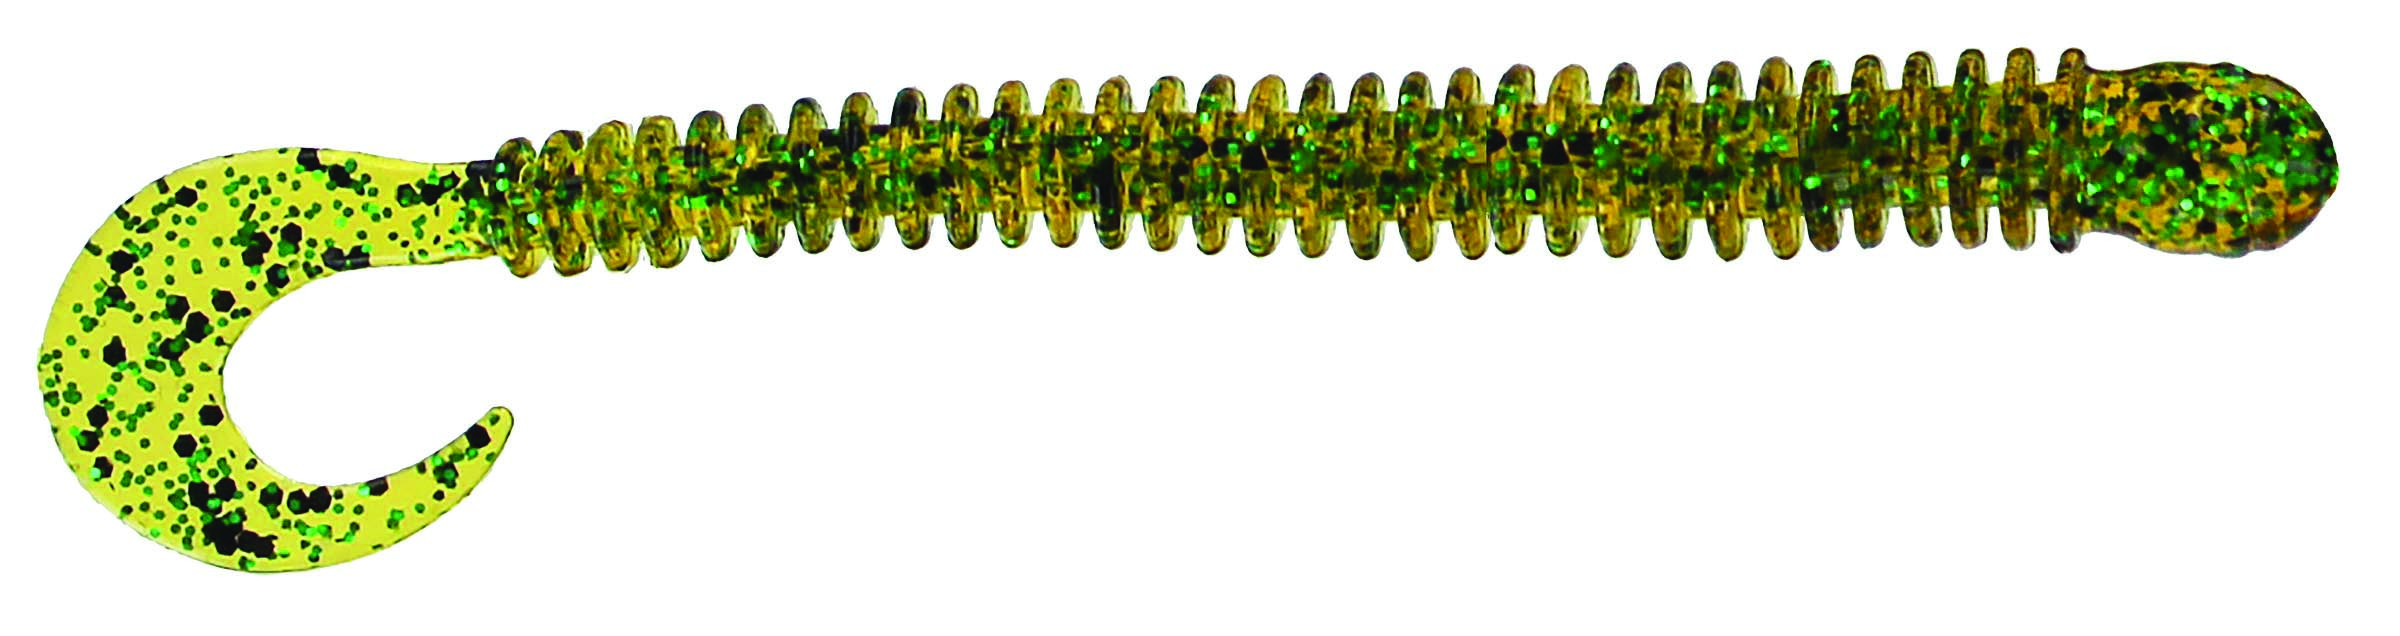 Big Bite Baits - Disc Ring Worm - 4 inch - RW-405 - PUMPKIN PEPPER GREEN